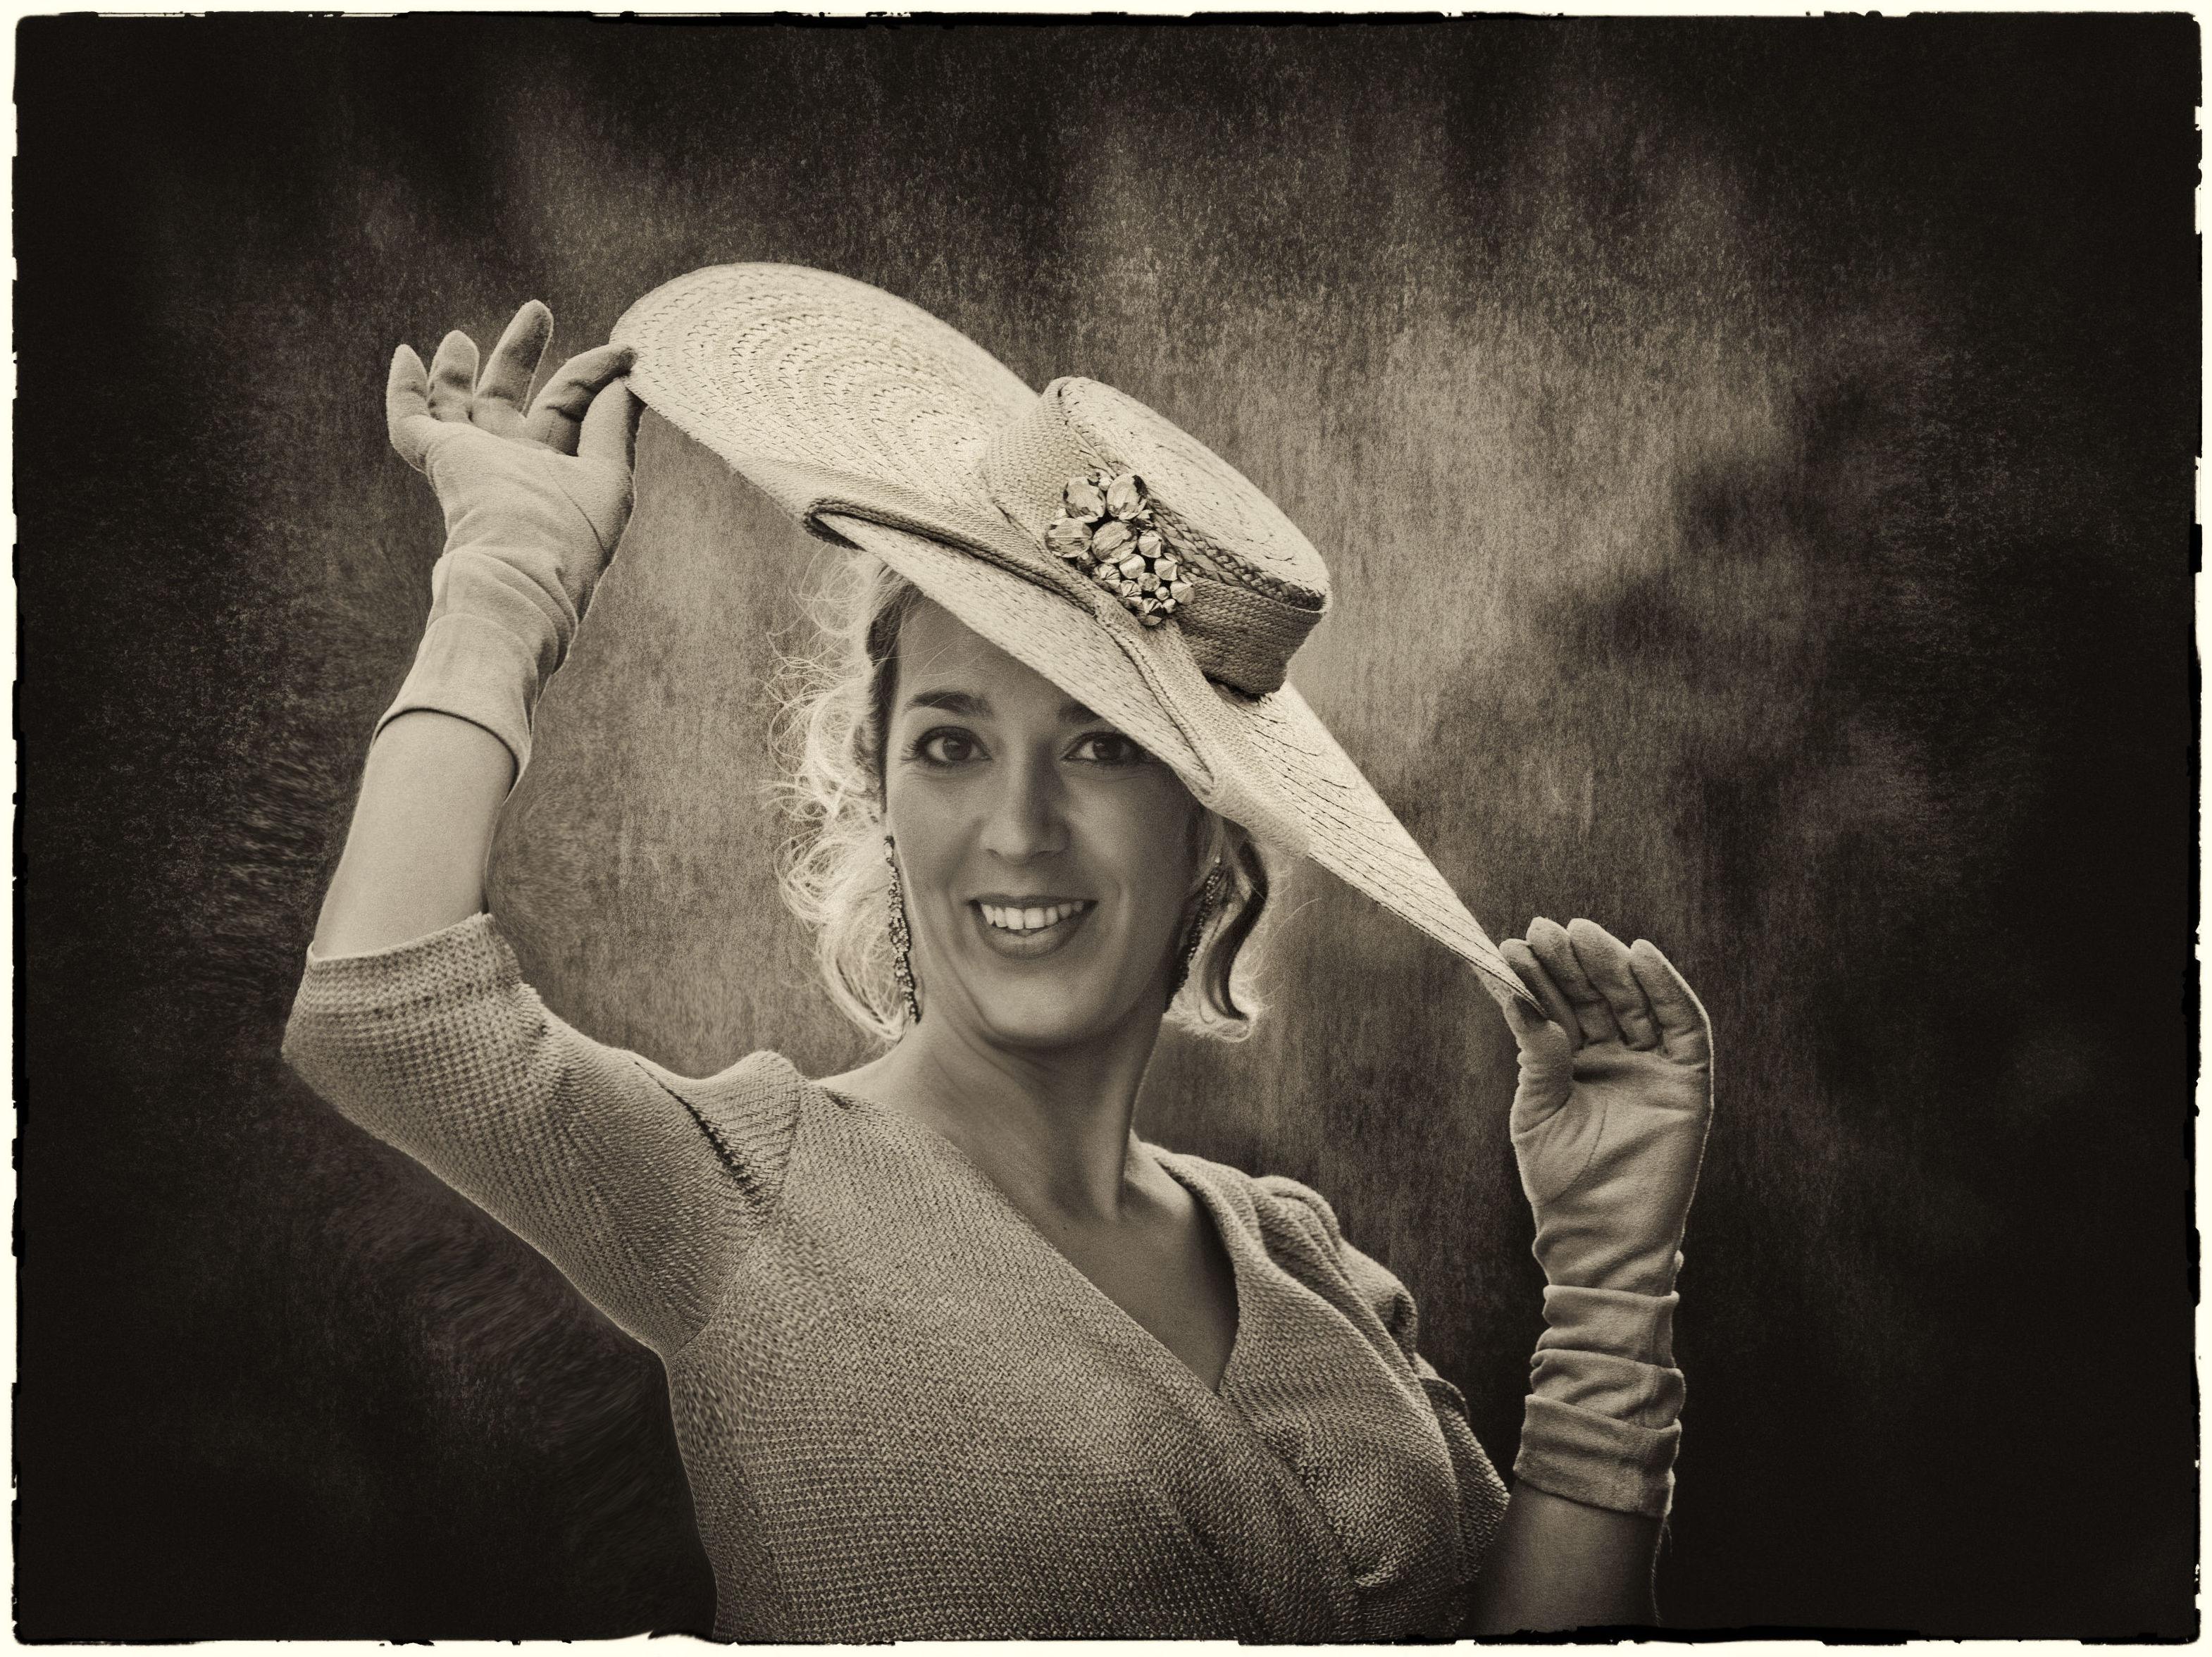 Bodas: Reportajes fotográficos de Pío Baruque Fotógrafos